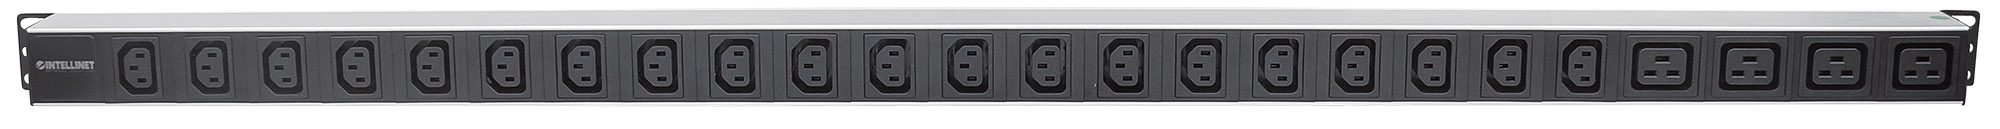 Vertical Rackmount 24-Output Power Distribution Unit (PDU)